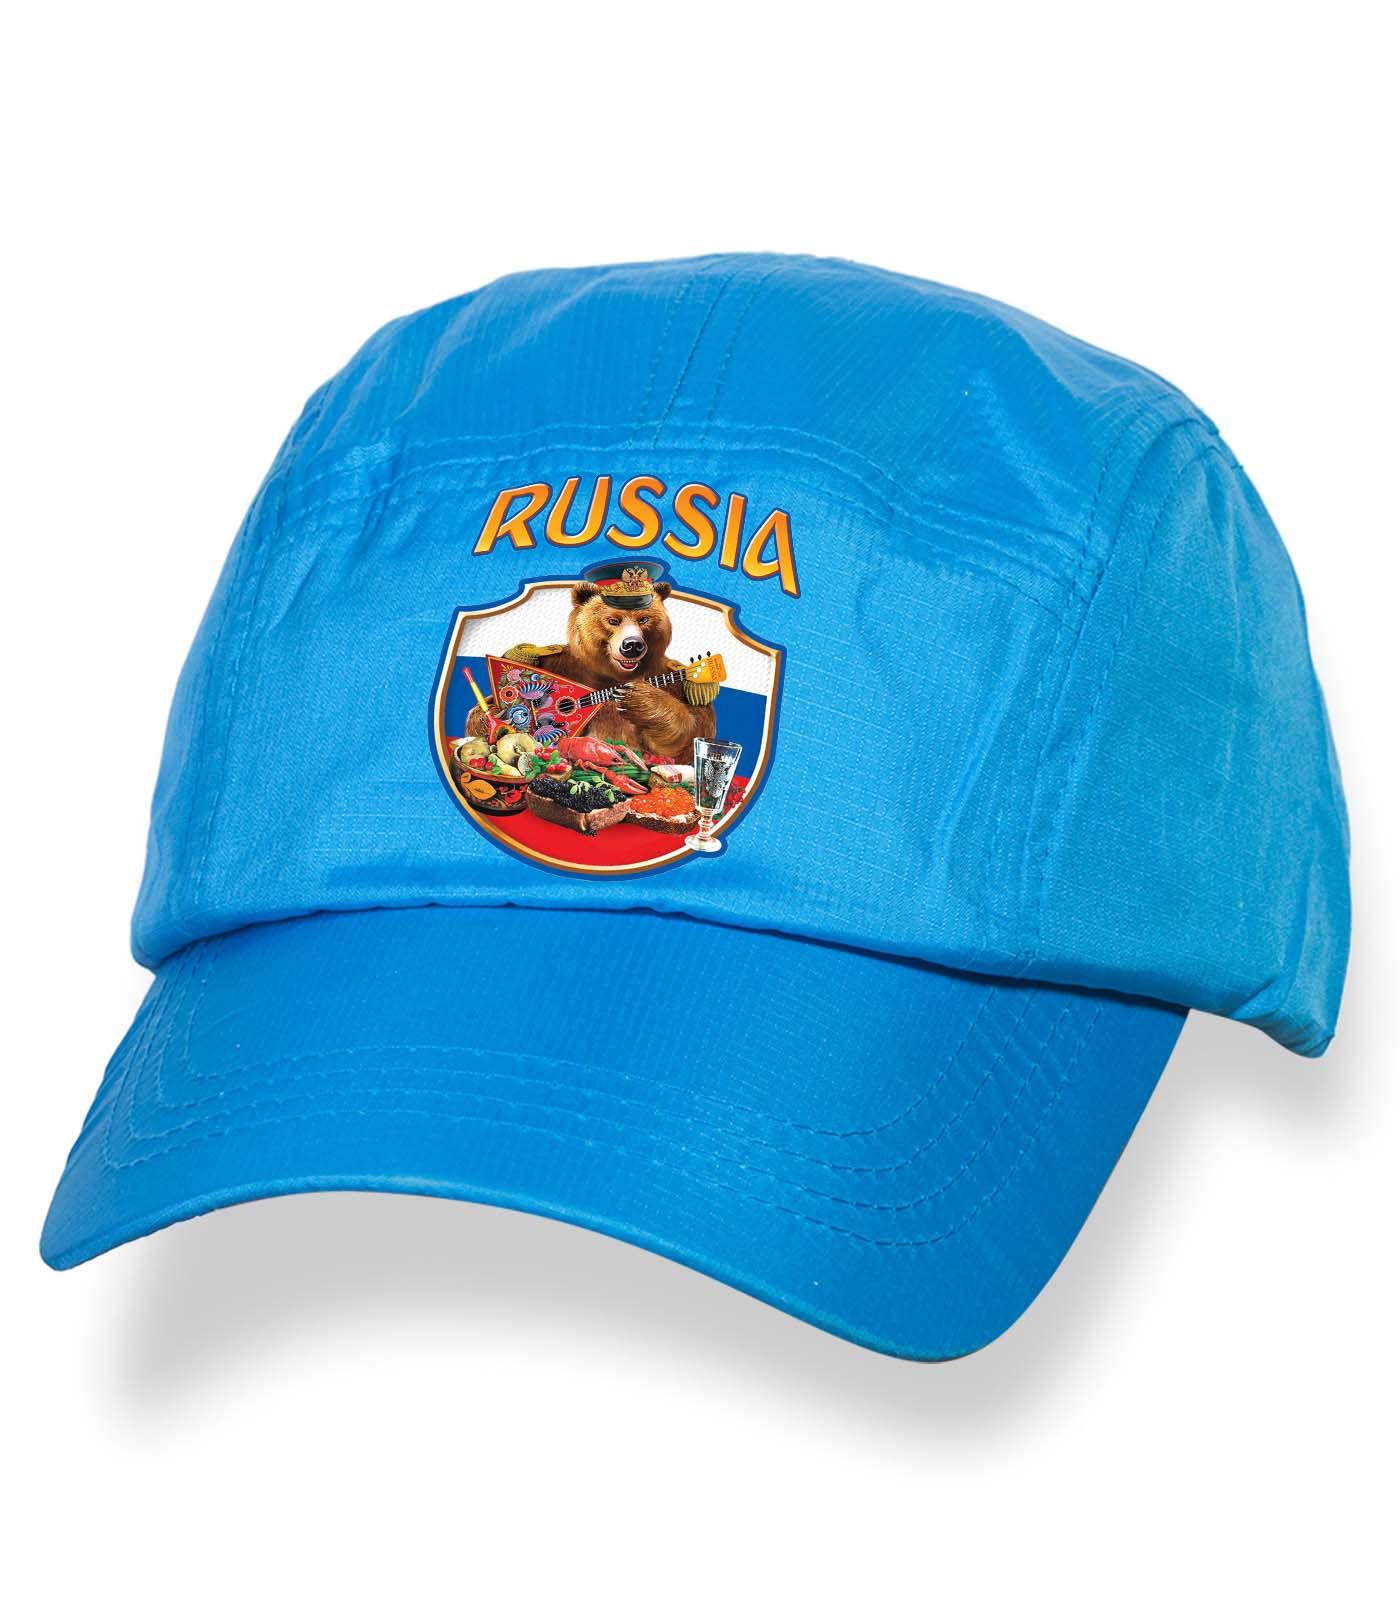 Крутая голубая кепка-пятипанелька с термонаклейкой Russia